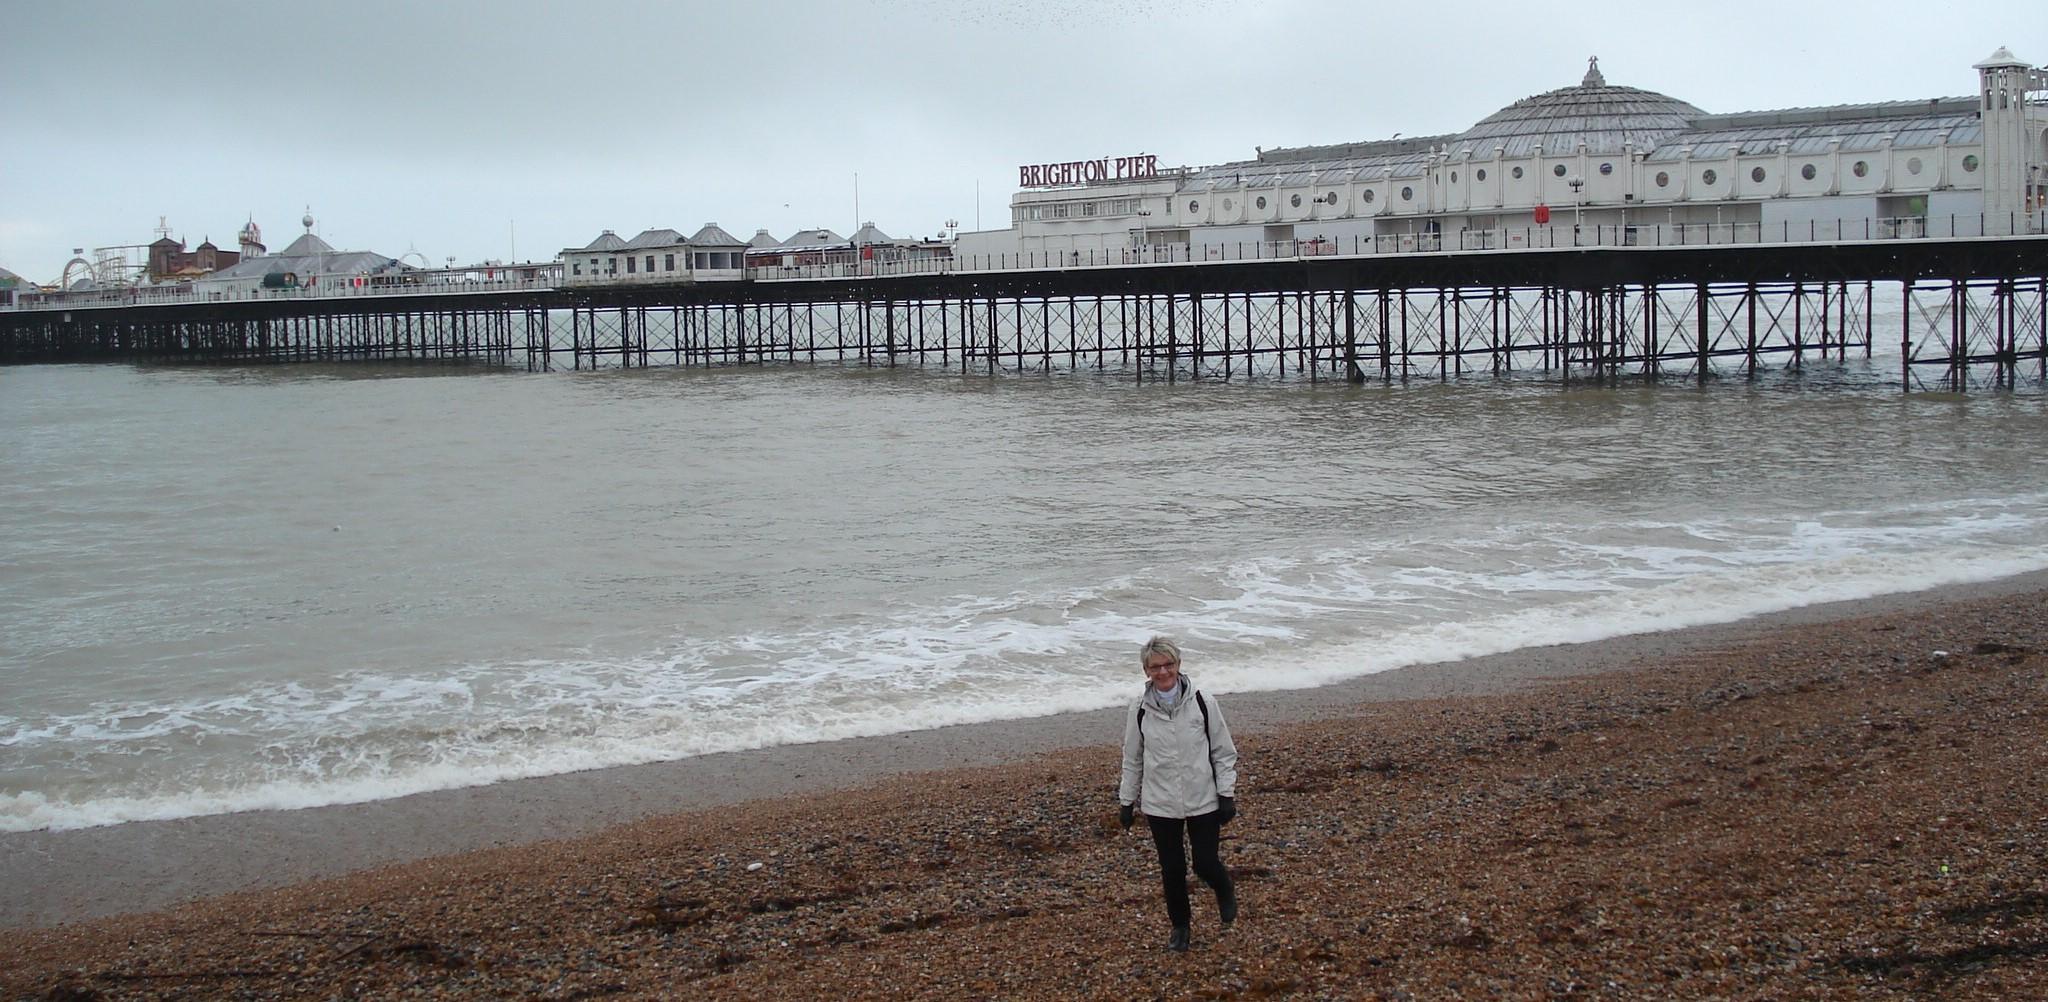 Brighton pir